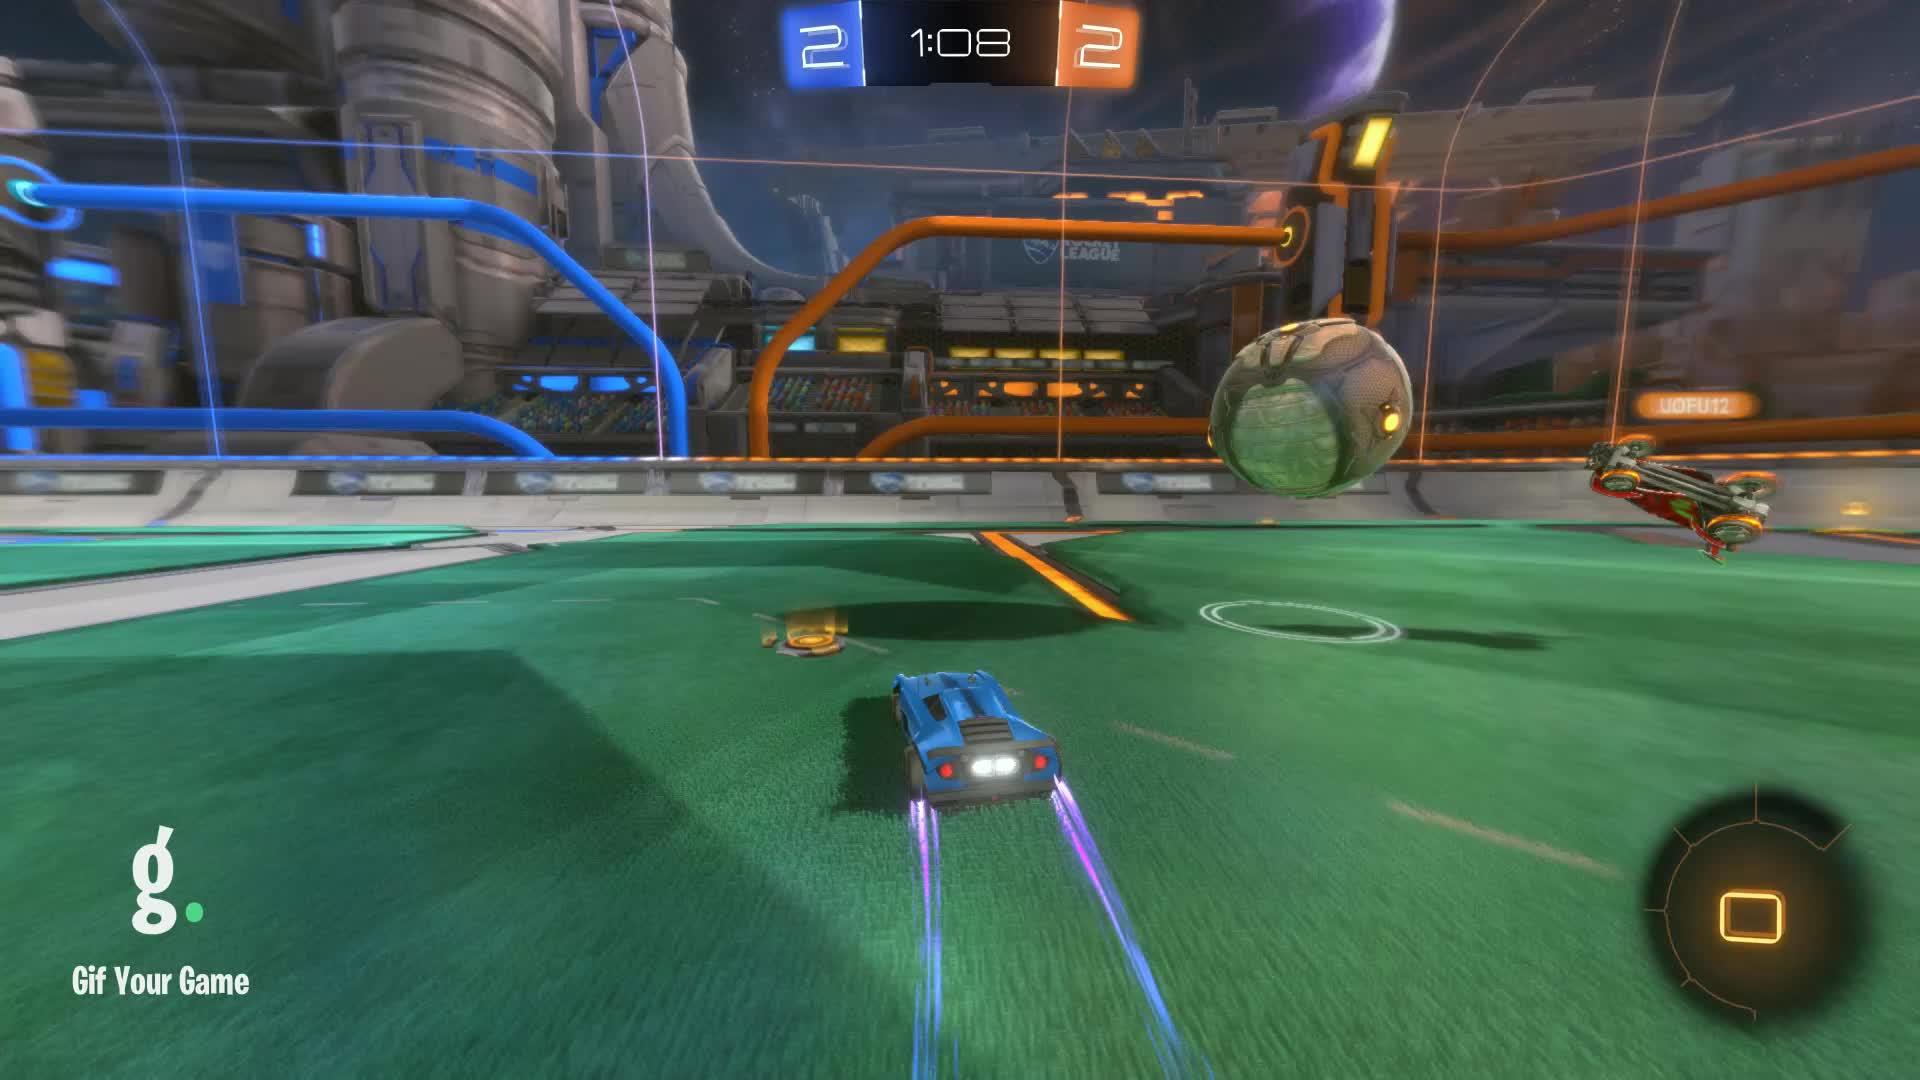 Gif Your Game, GifYourGame, Rocket League, RocketLeague, Goal 5: Gif Your Game GIFs